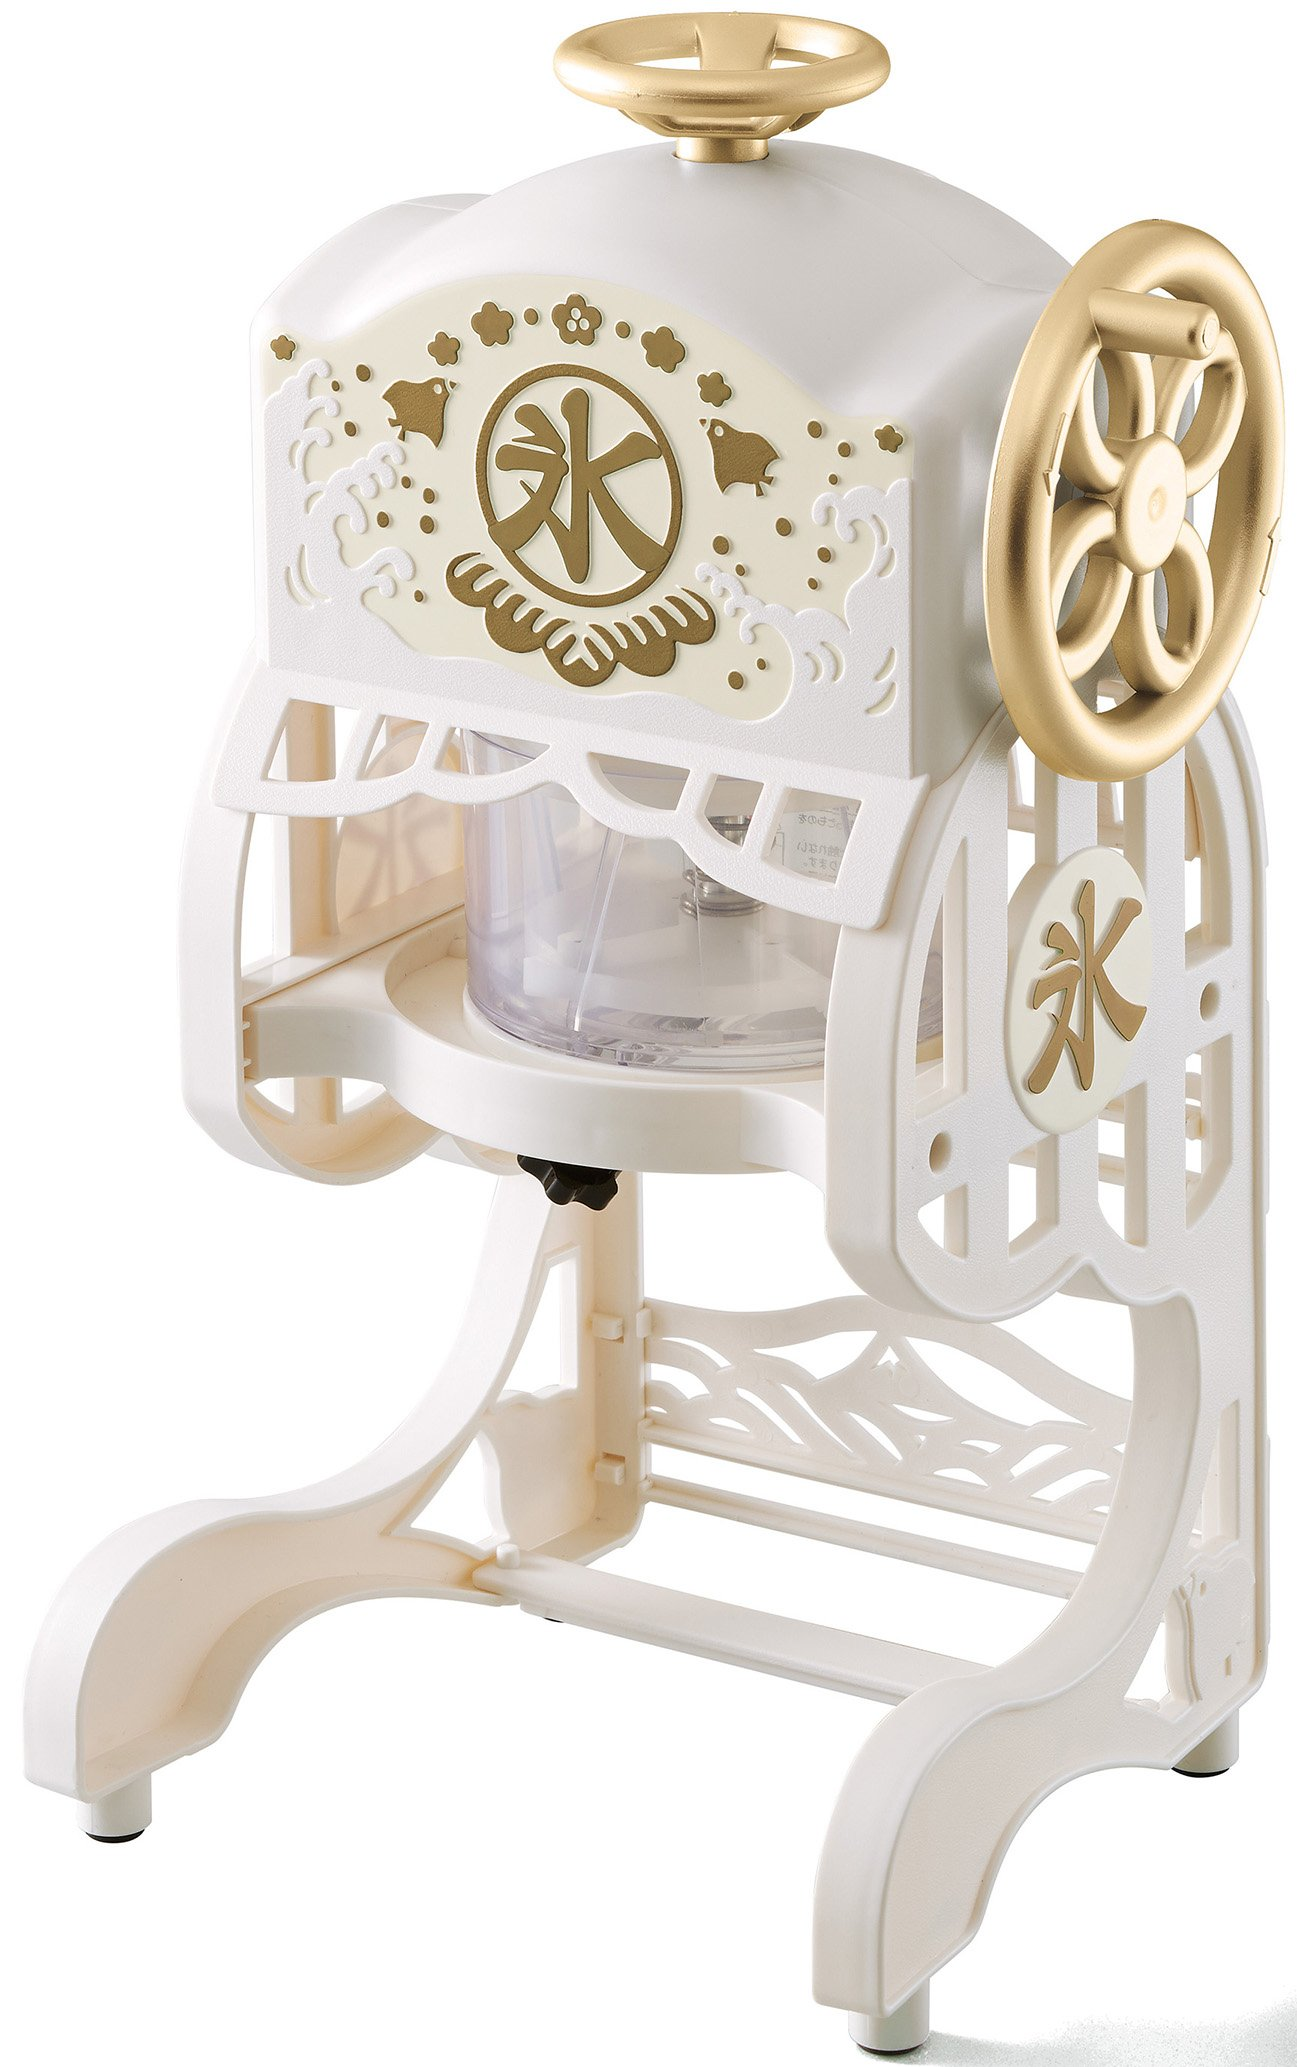 DOSHISHA electric Full-fledged fluffy ice machine DCSP-1651W (White Gold)【Japan domestic goods】